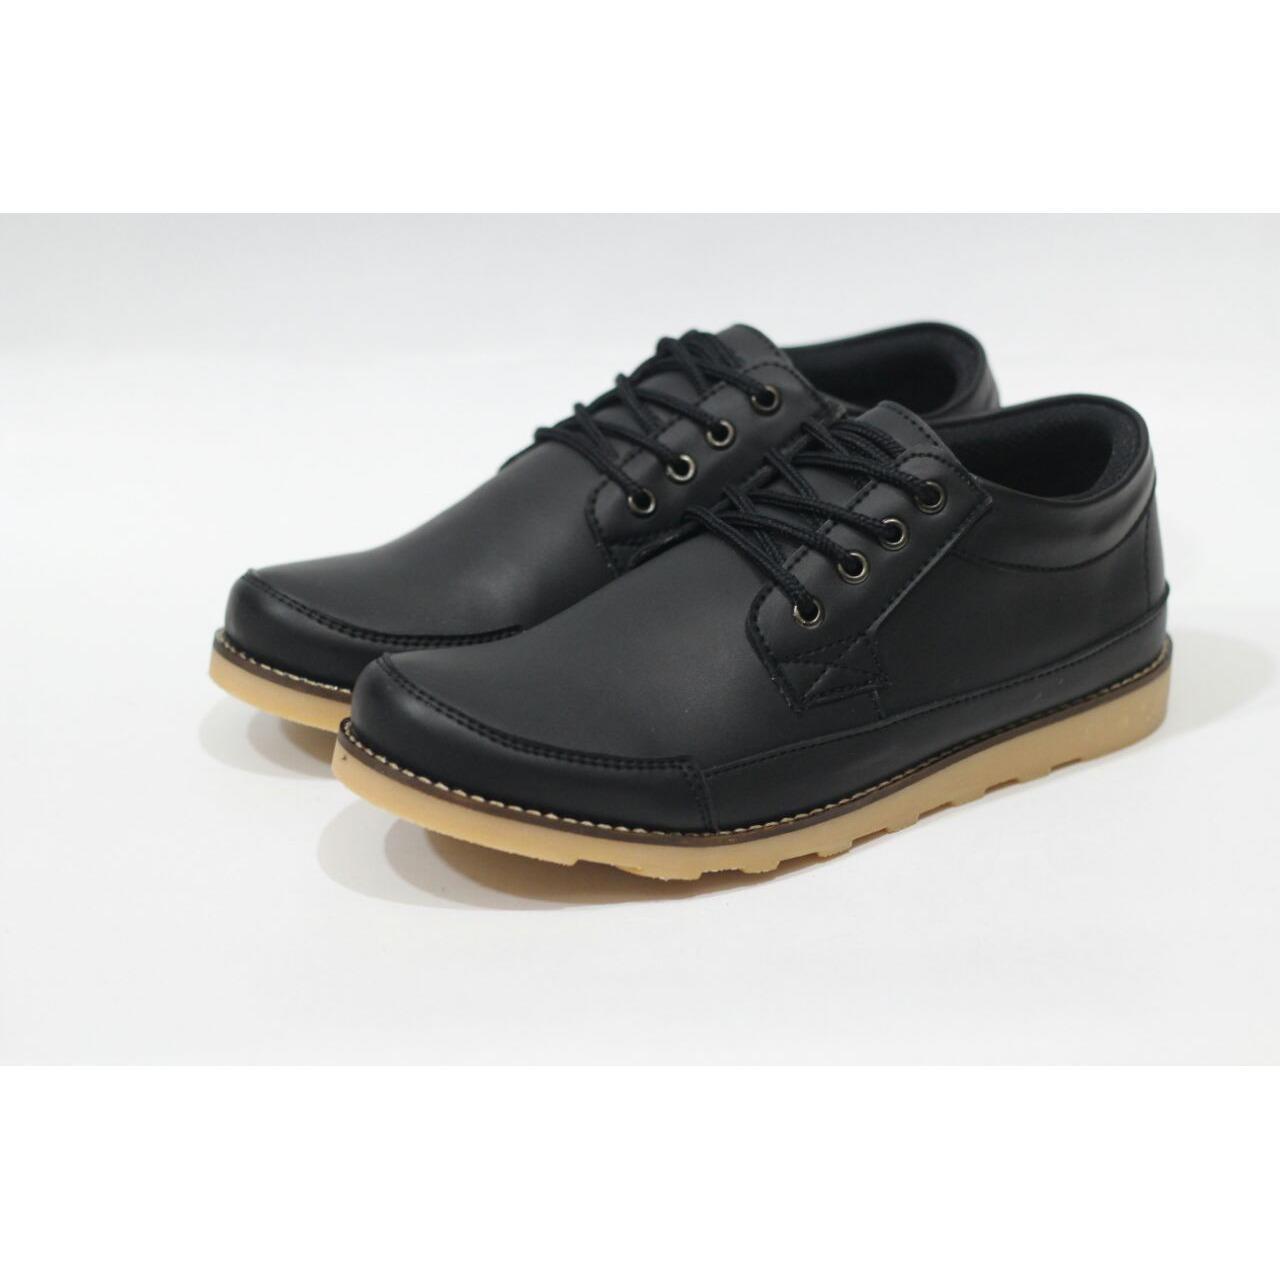 Mr La Aldhino Collection Sepatu Boots 5006 Tan Update Daftar Harga Sonne Alice Sc5006 Orange Premium Lady Comfort Leather Shoes Rp 200000